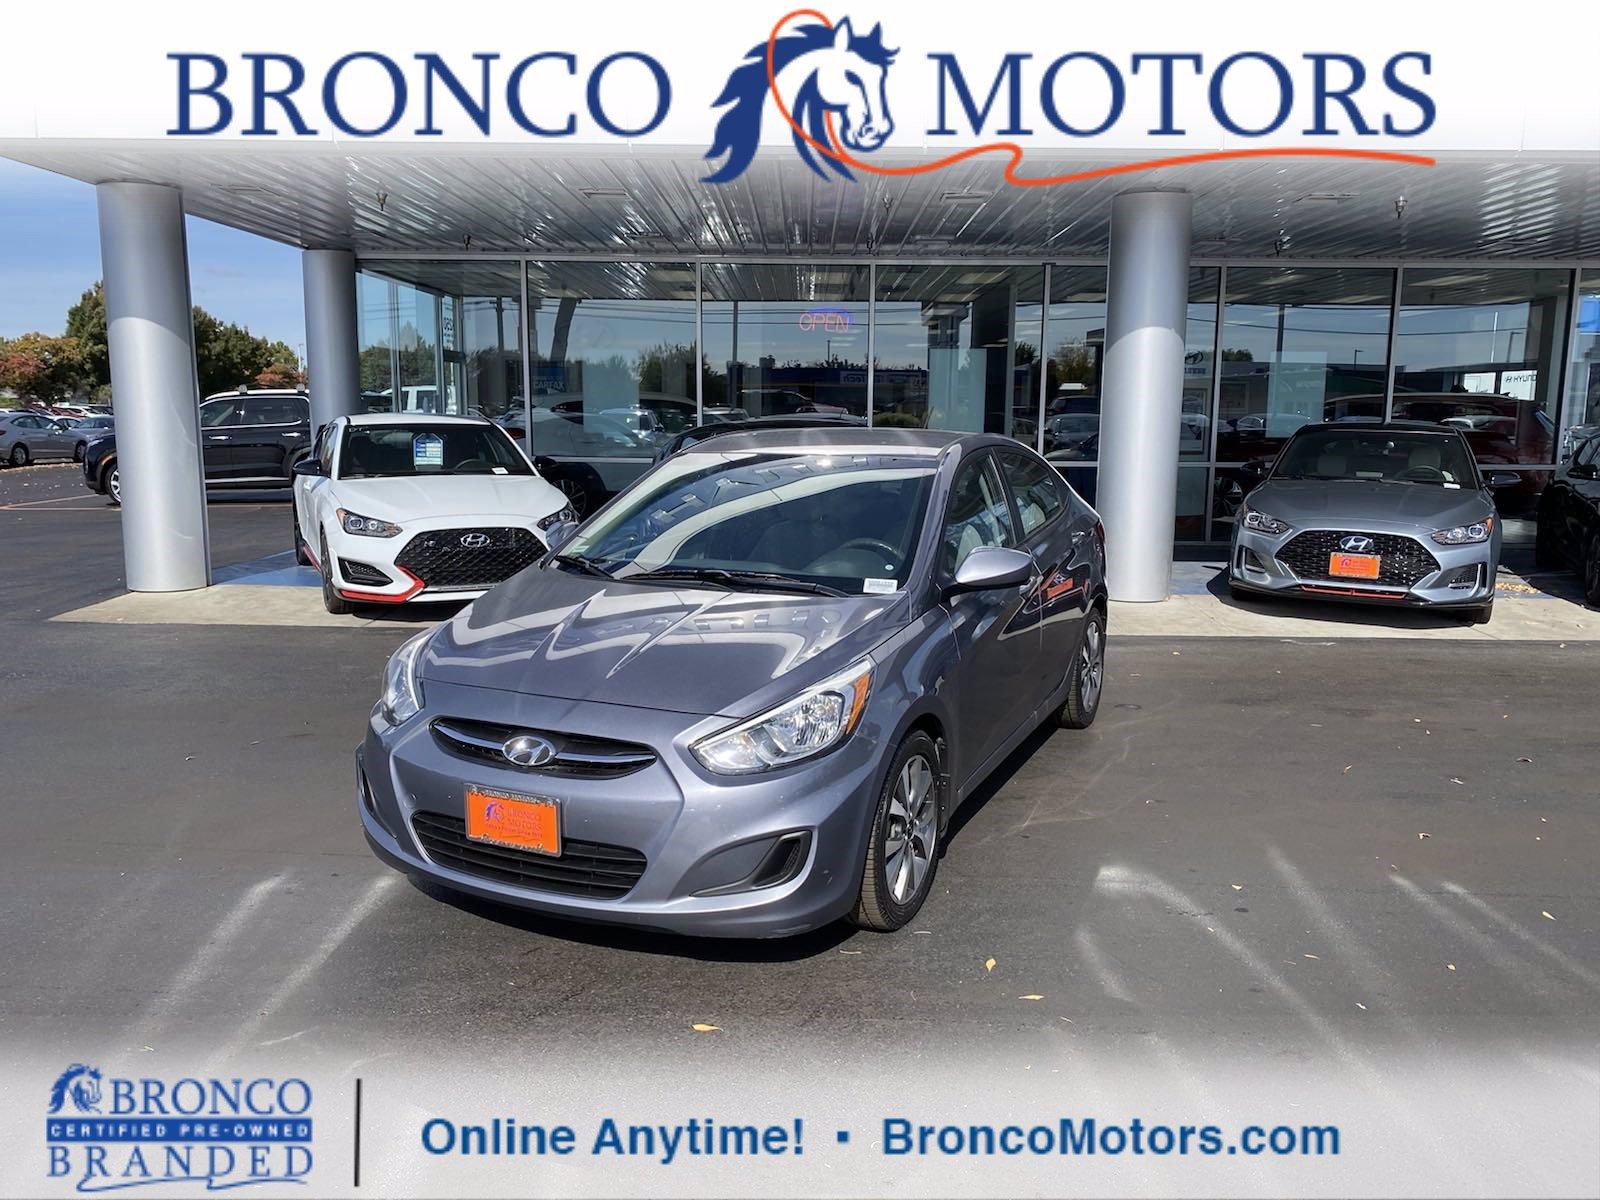 Used Cars Trucks And Suvs For Sale Bronco Motors Hyundai